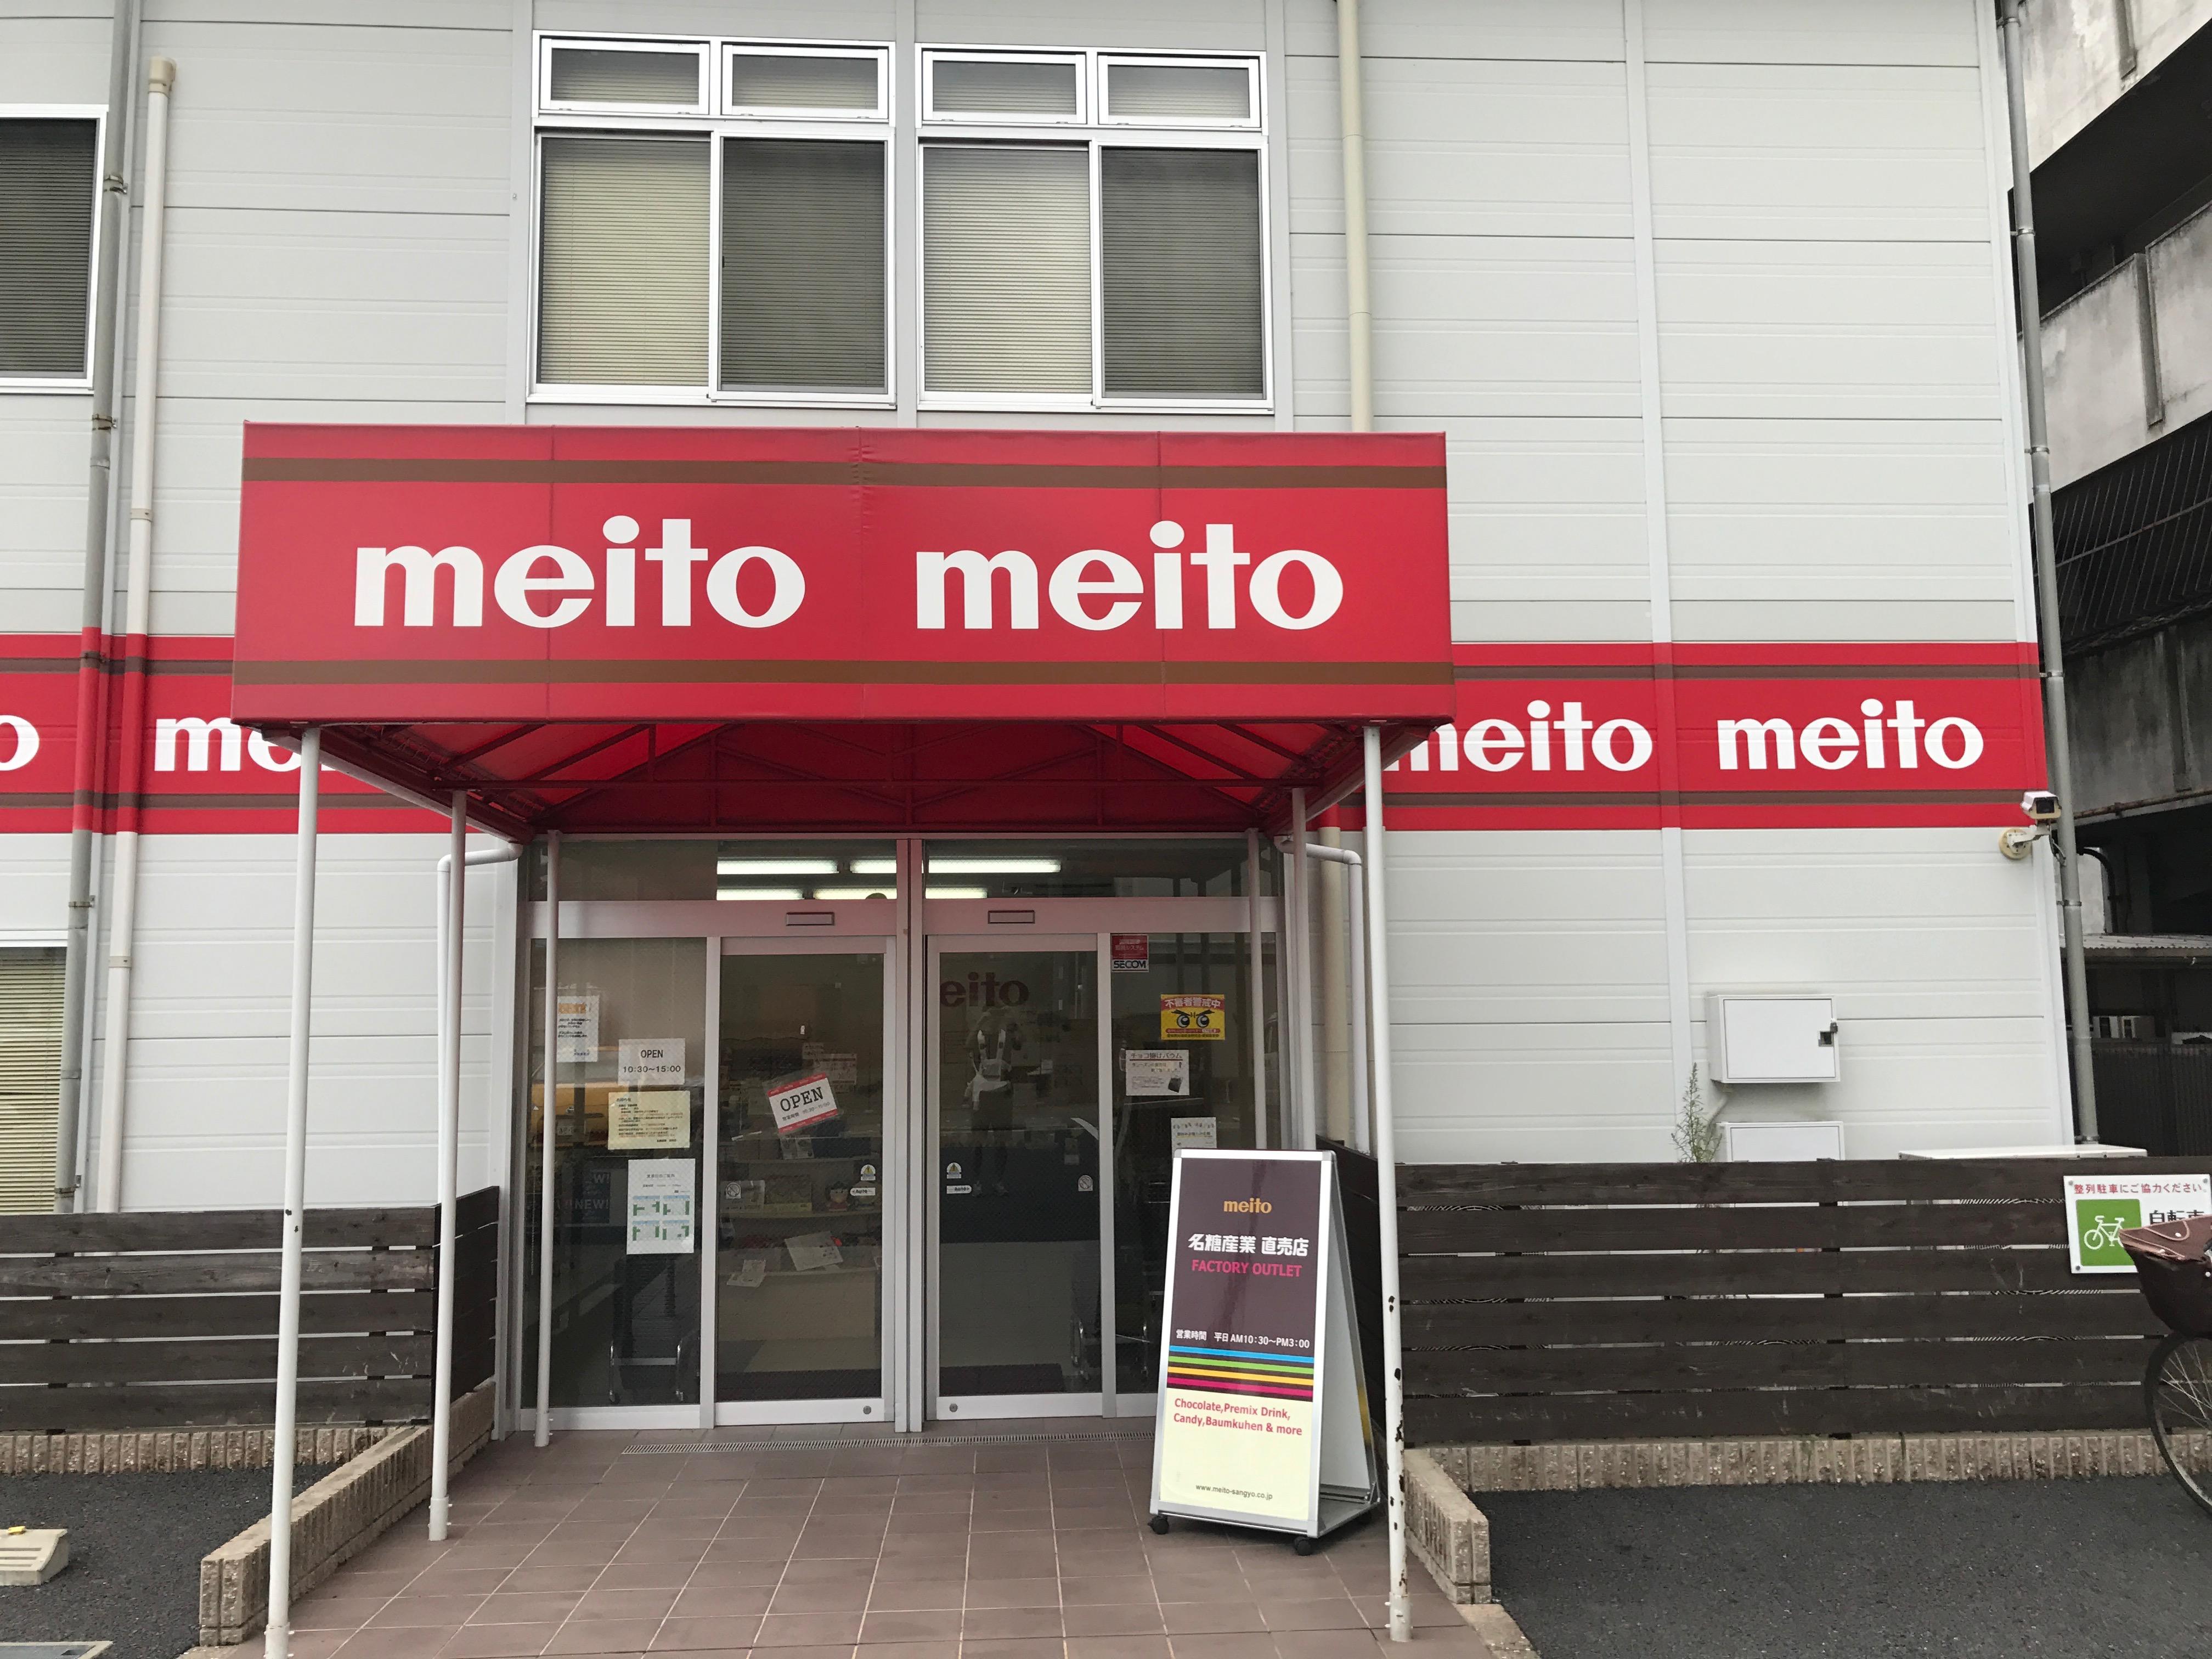 meito 直売店 外観